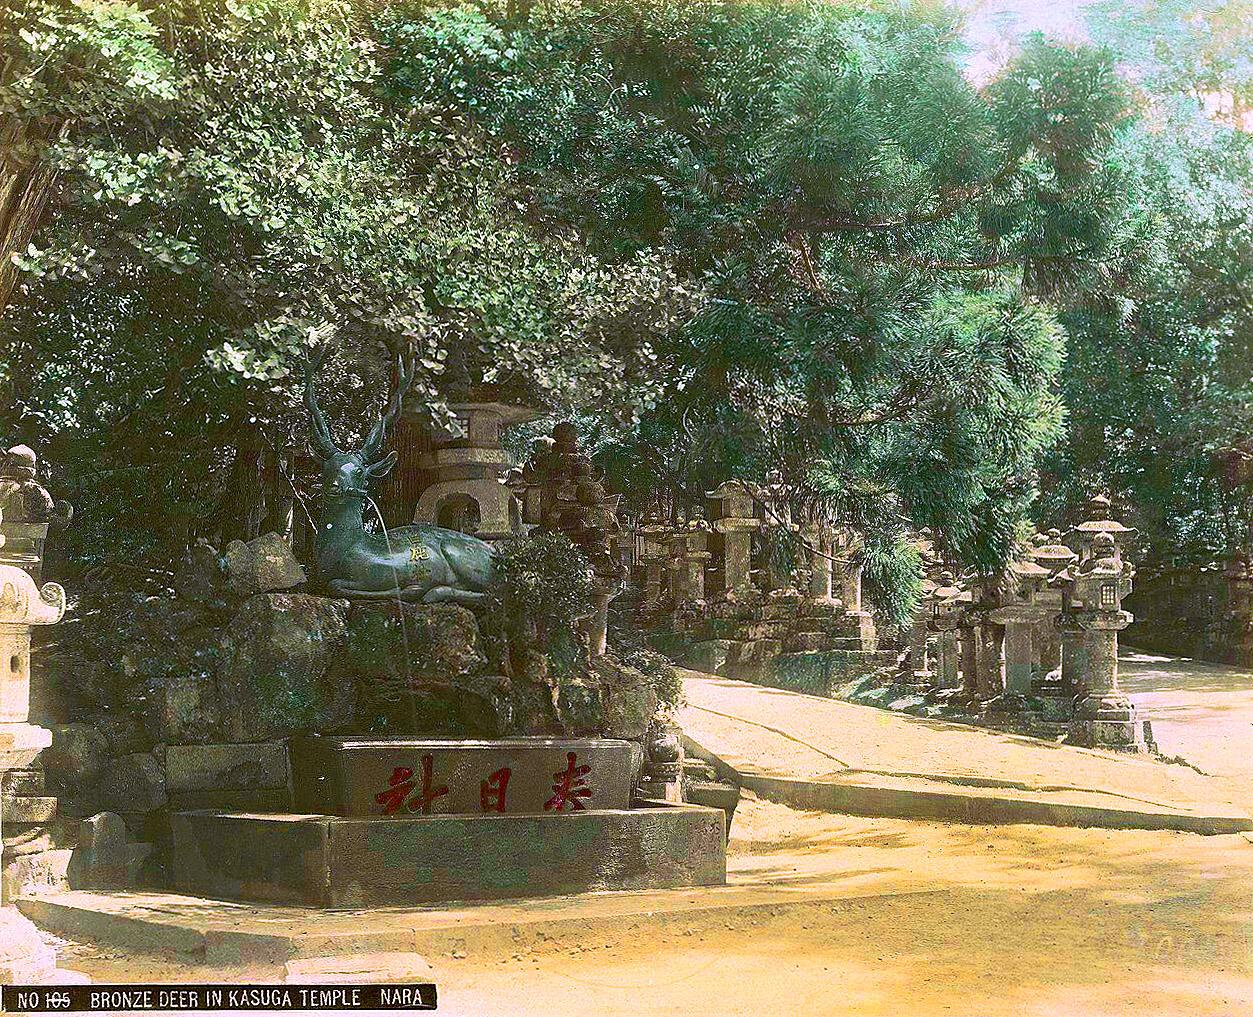 1870 Bronze Deer in Kasuga Temple, Nara.jpg